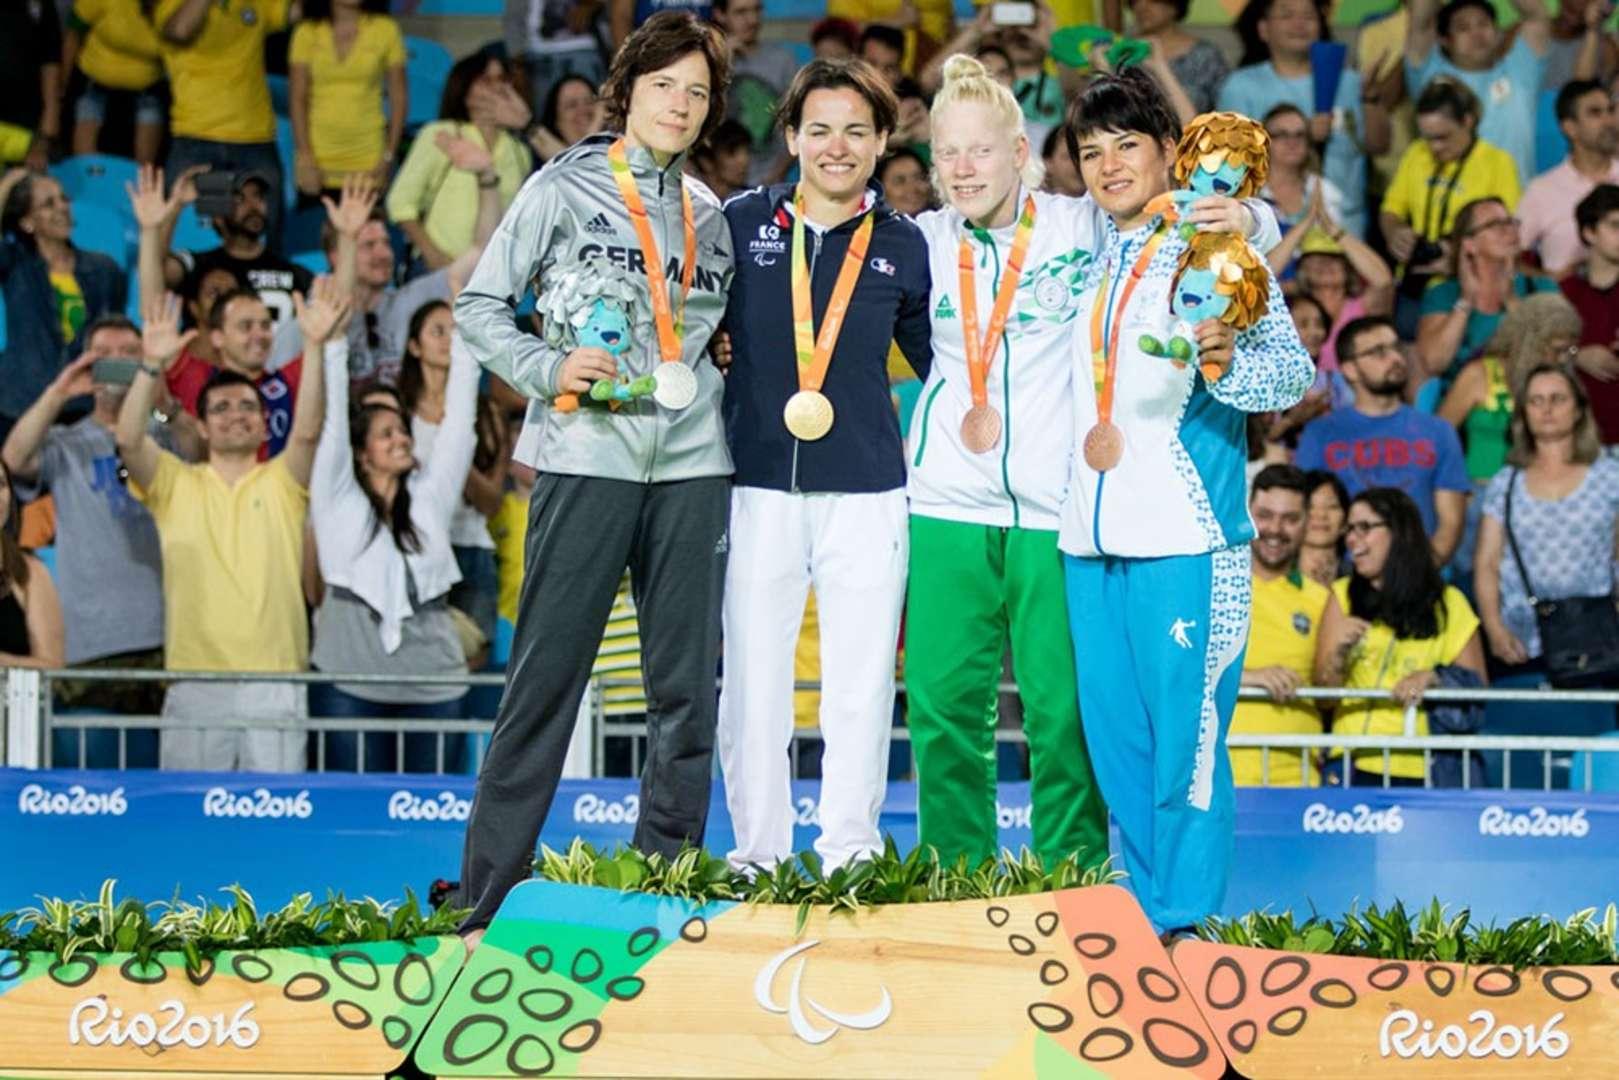 52KG-PARALYMPICS-RIO-2016-JUDO-147340959